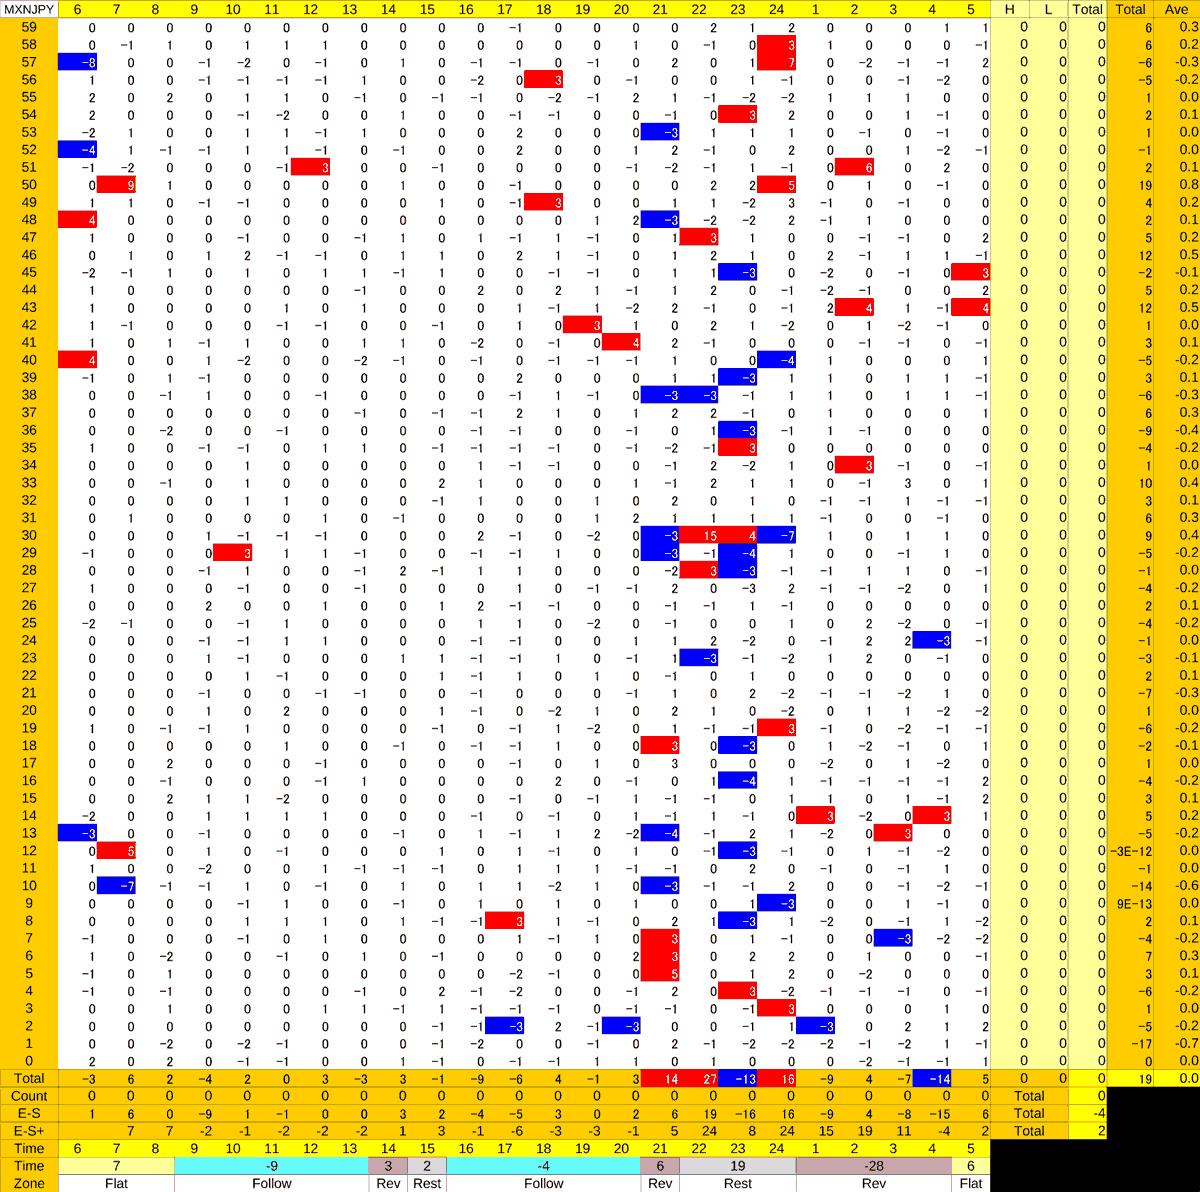 20210113_HS(3)MXNJPY